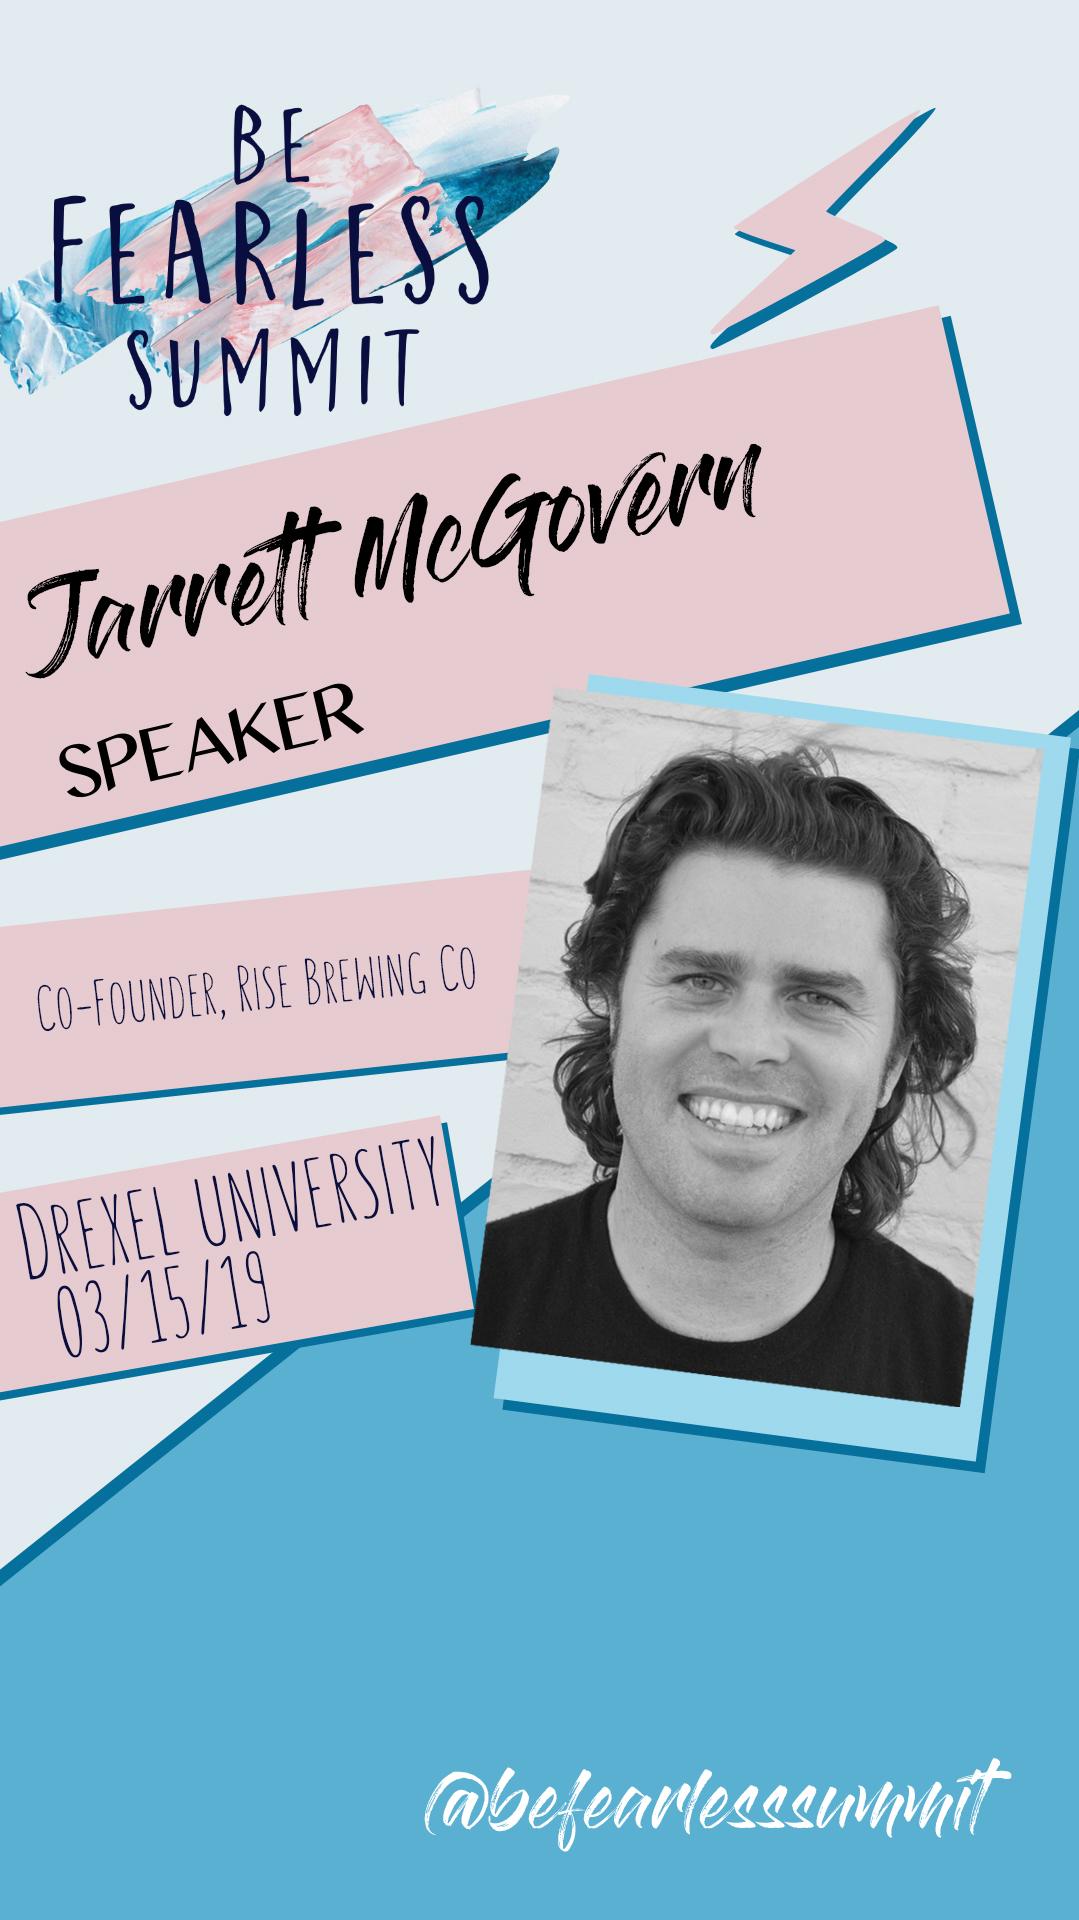 Jarrett McGovern_new (2).jpg